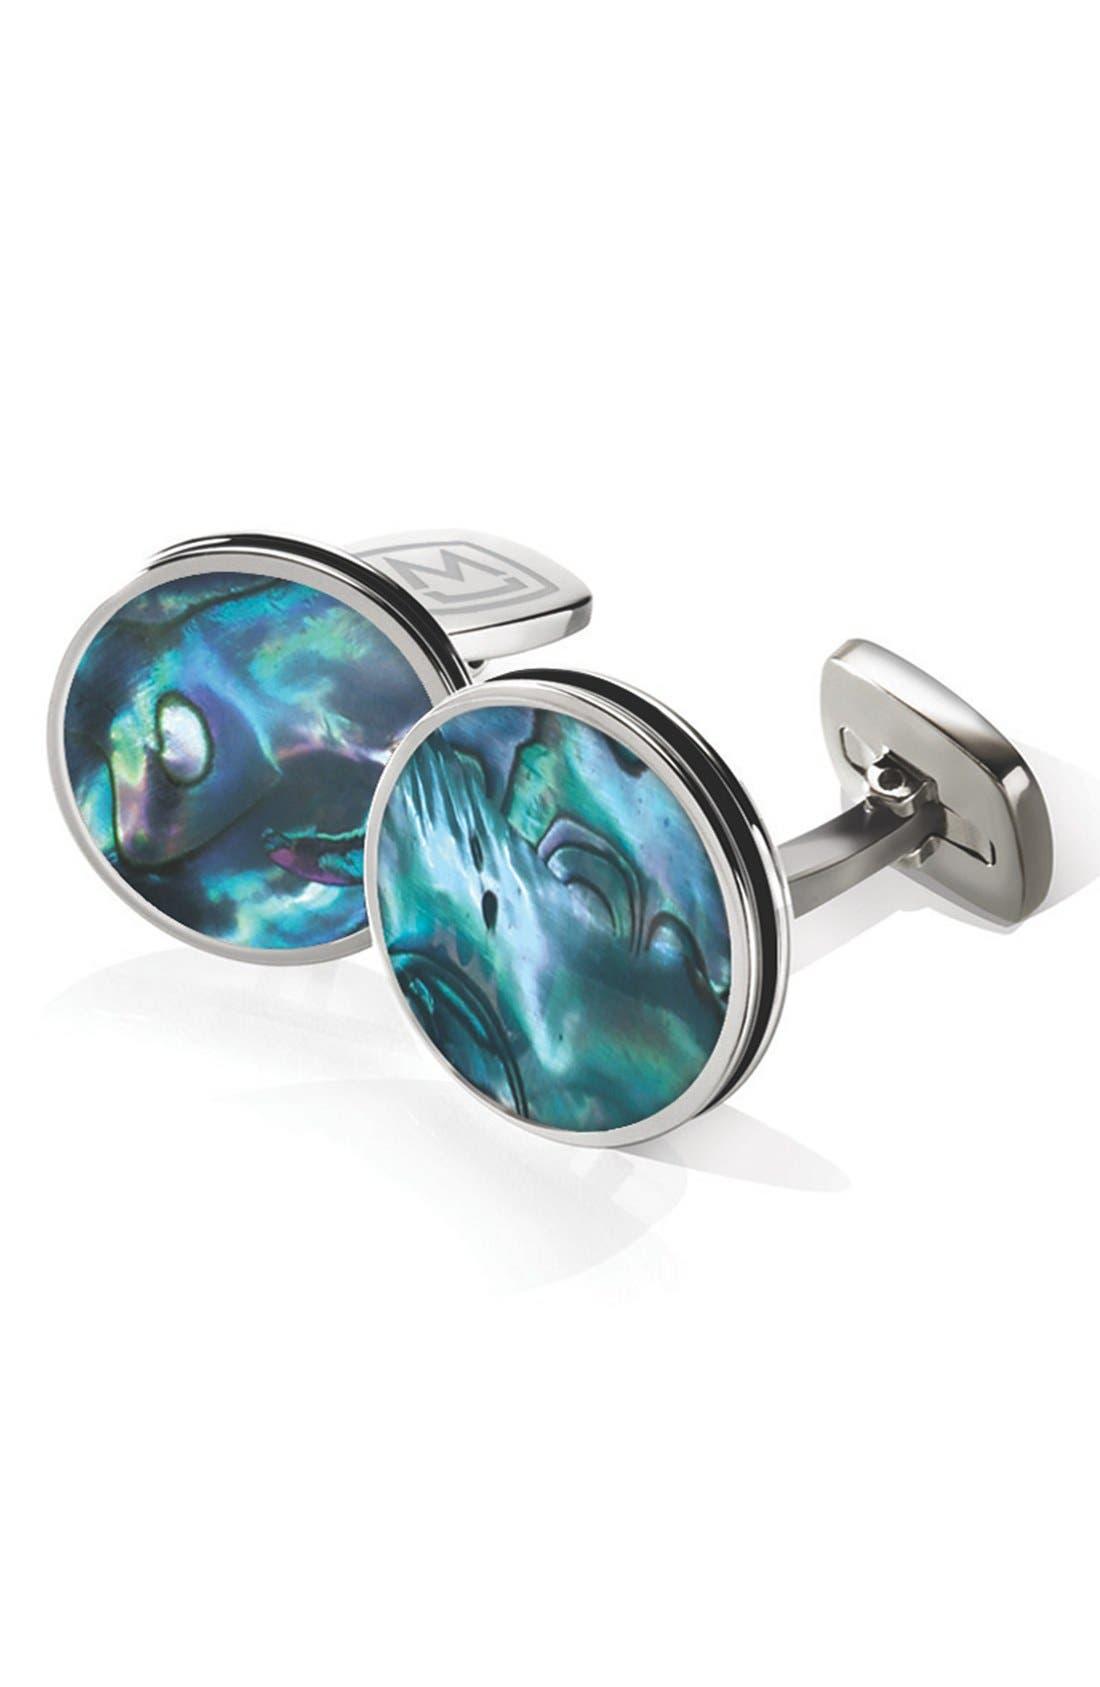 Men's M-Clip Abalone Cuff Links